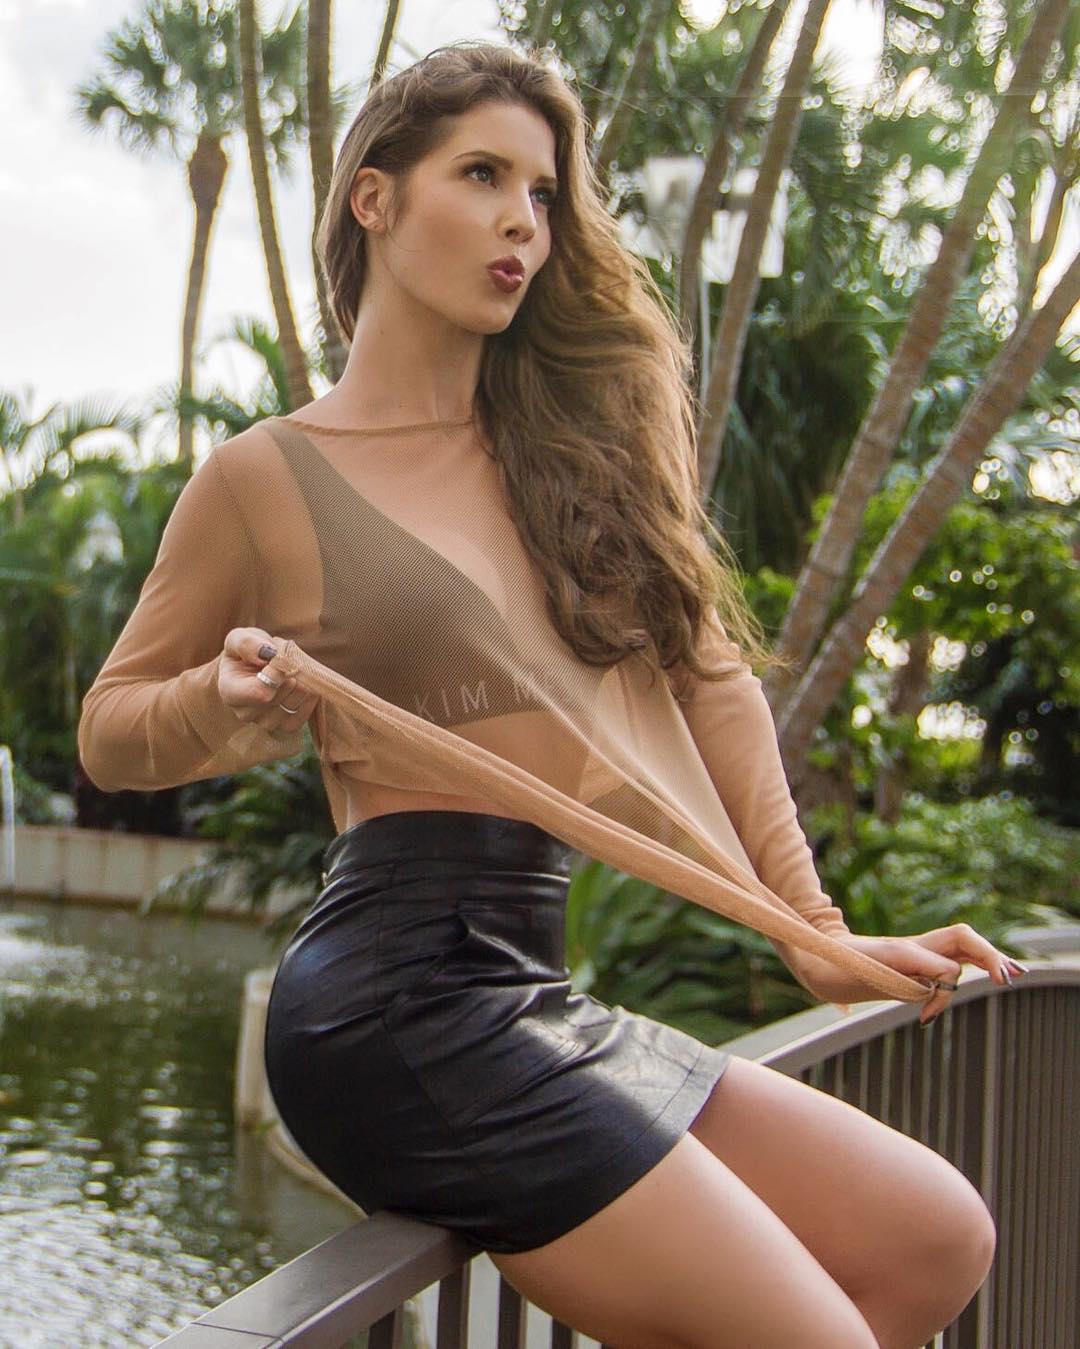 amanda nude sexy hot